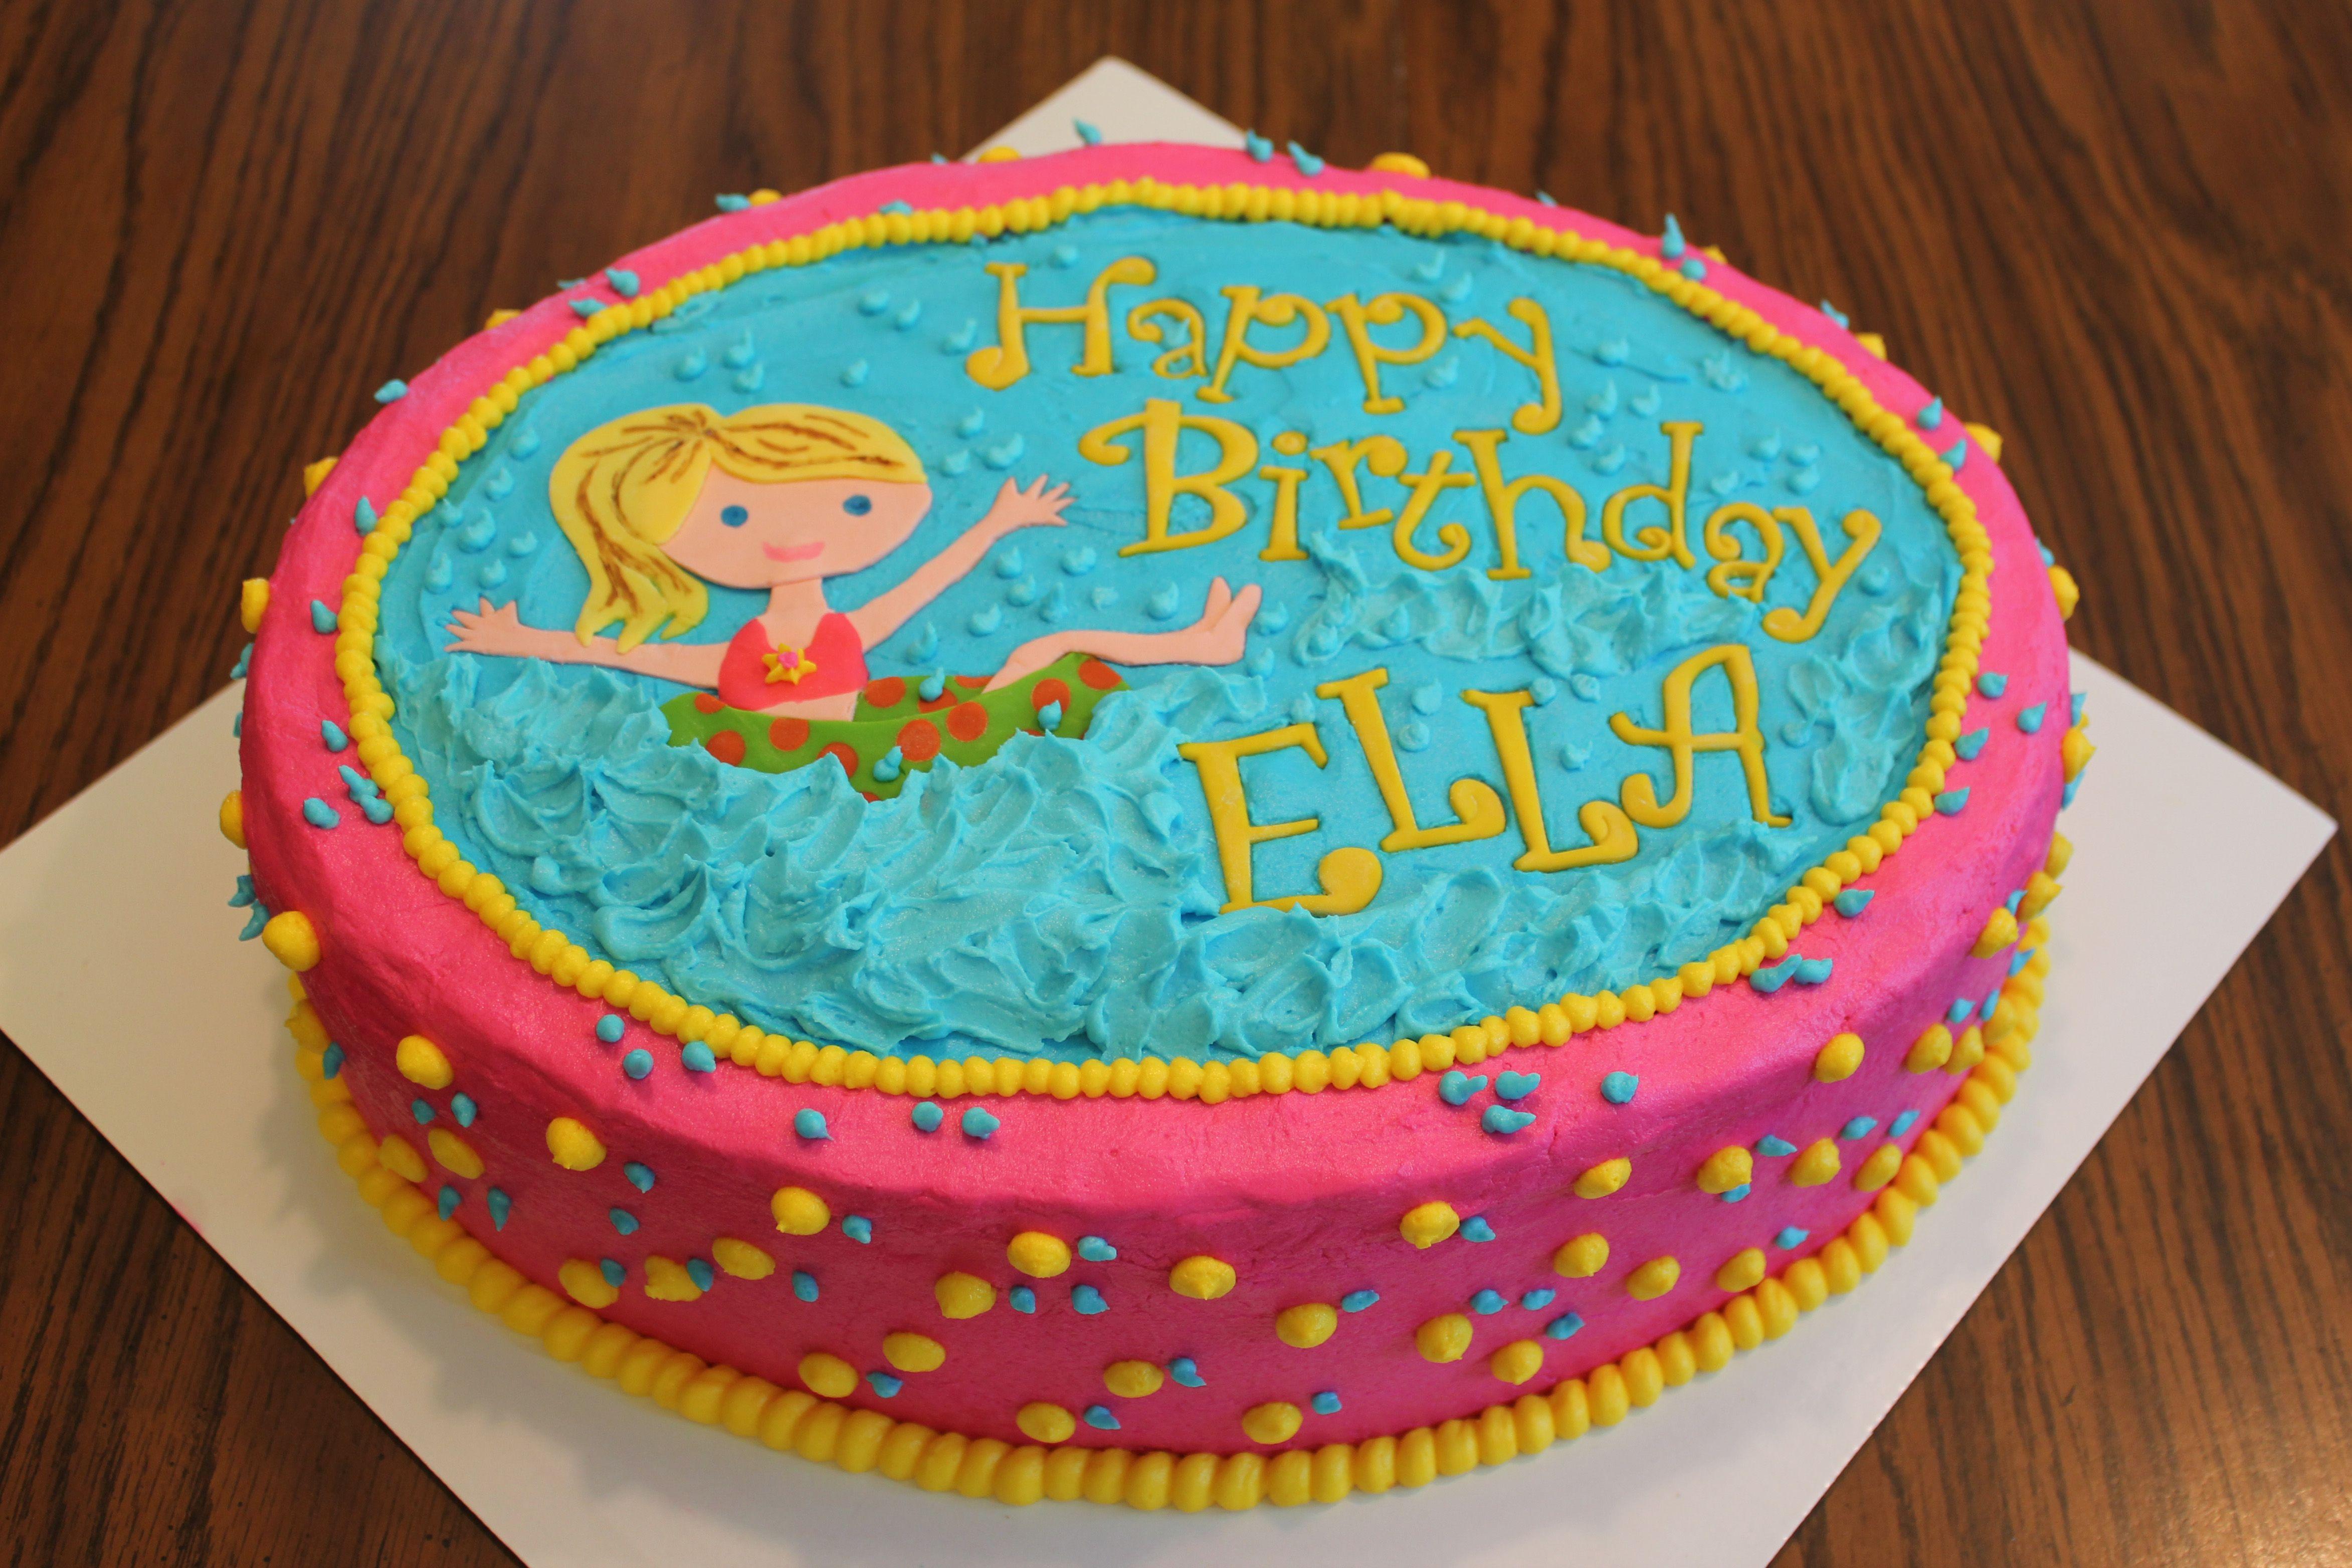 Gudetama In Bikini Cake J Petite Patisserie